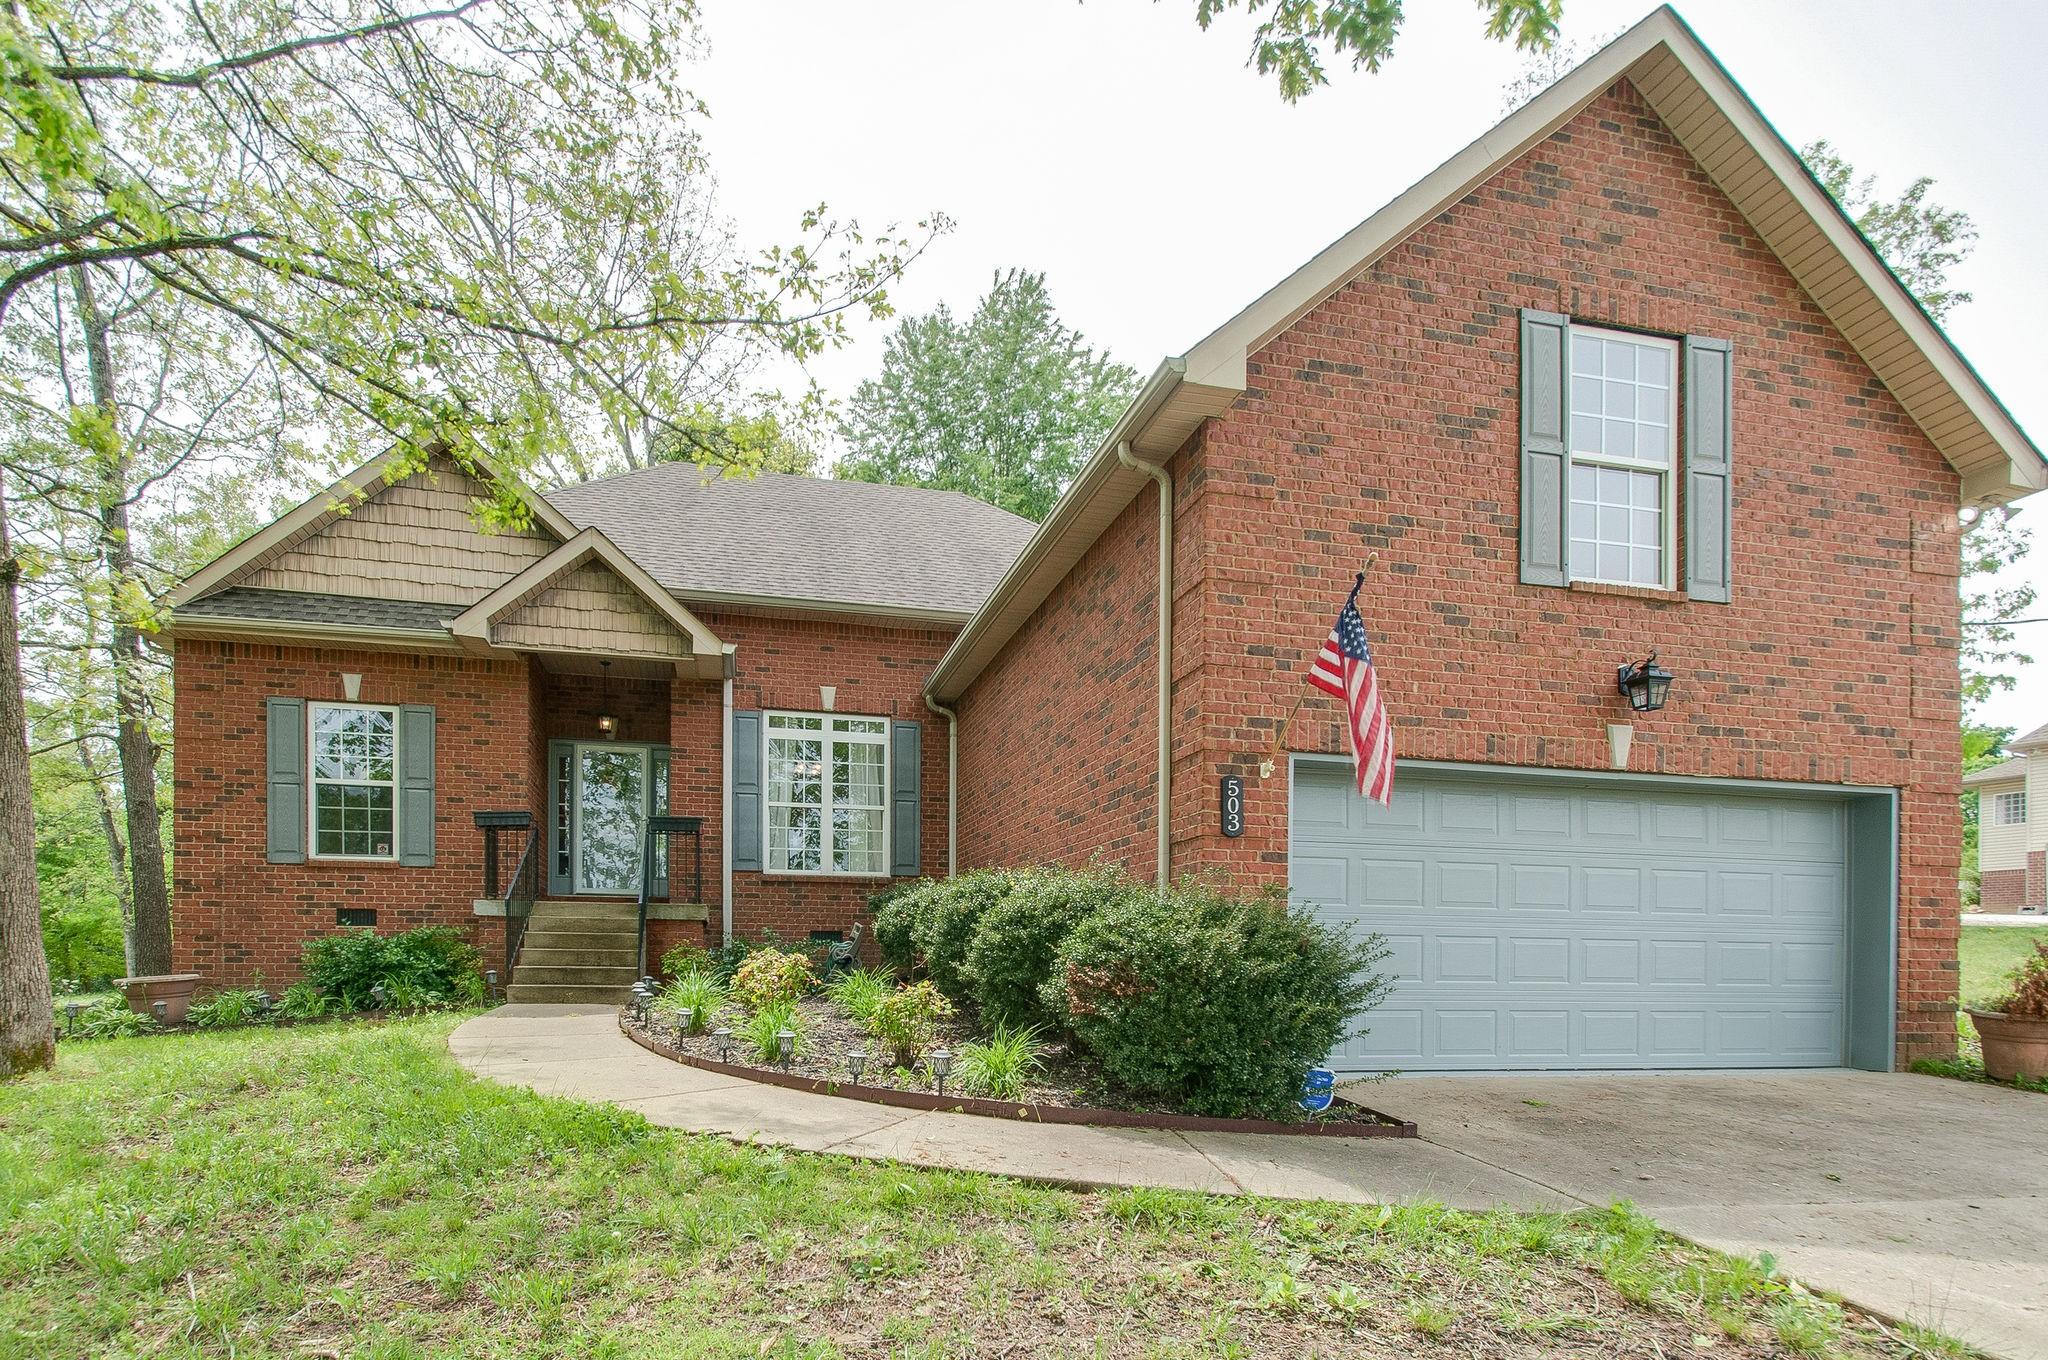 503 Red Fox Dr, Burns, TN 37029 - Burns, TN real estate listing